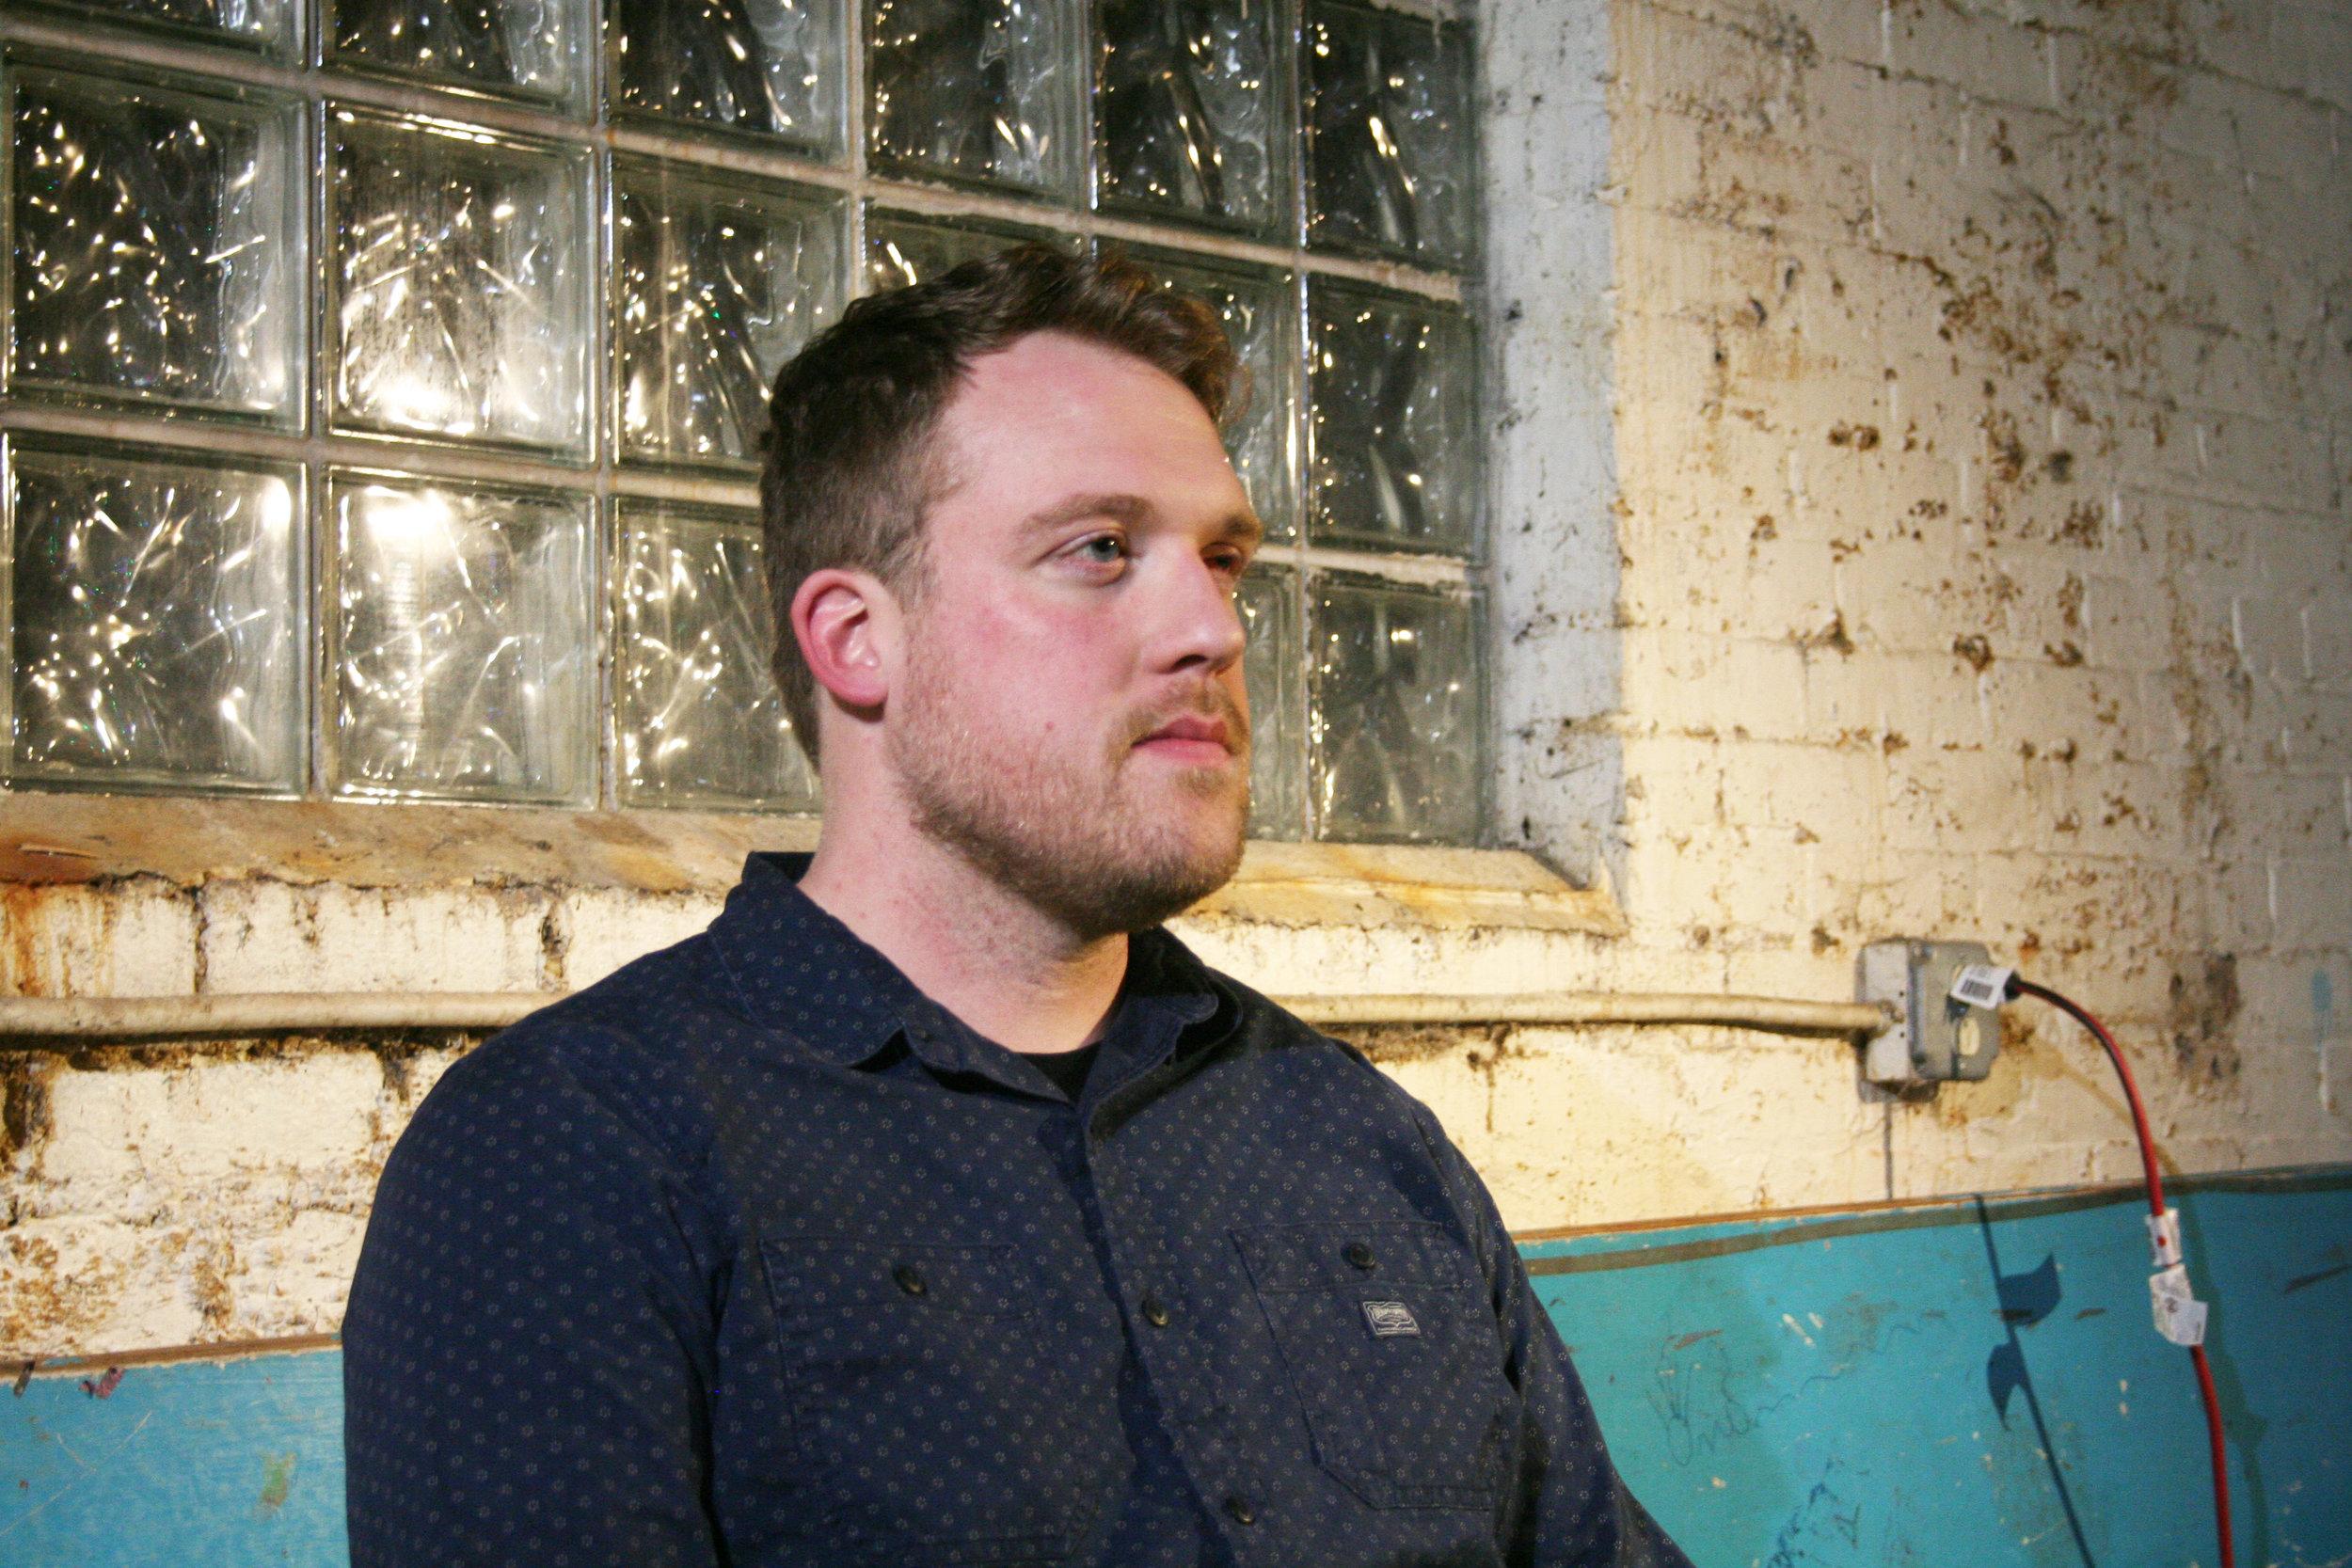 Darren Cross at Forest City Brewery 2-23-18.JPG